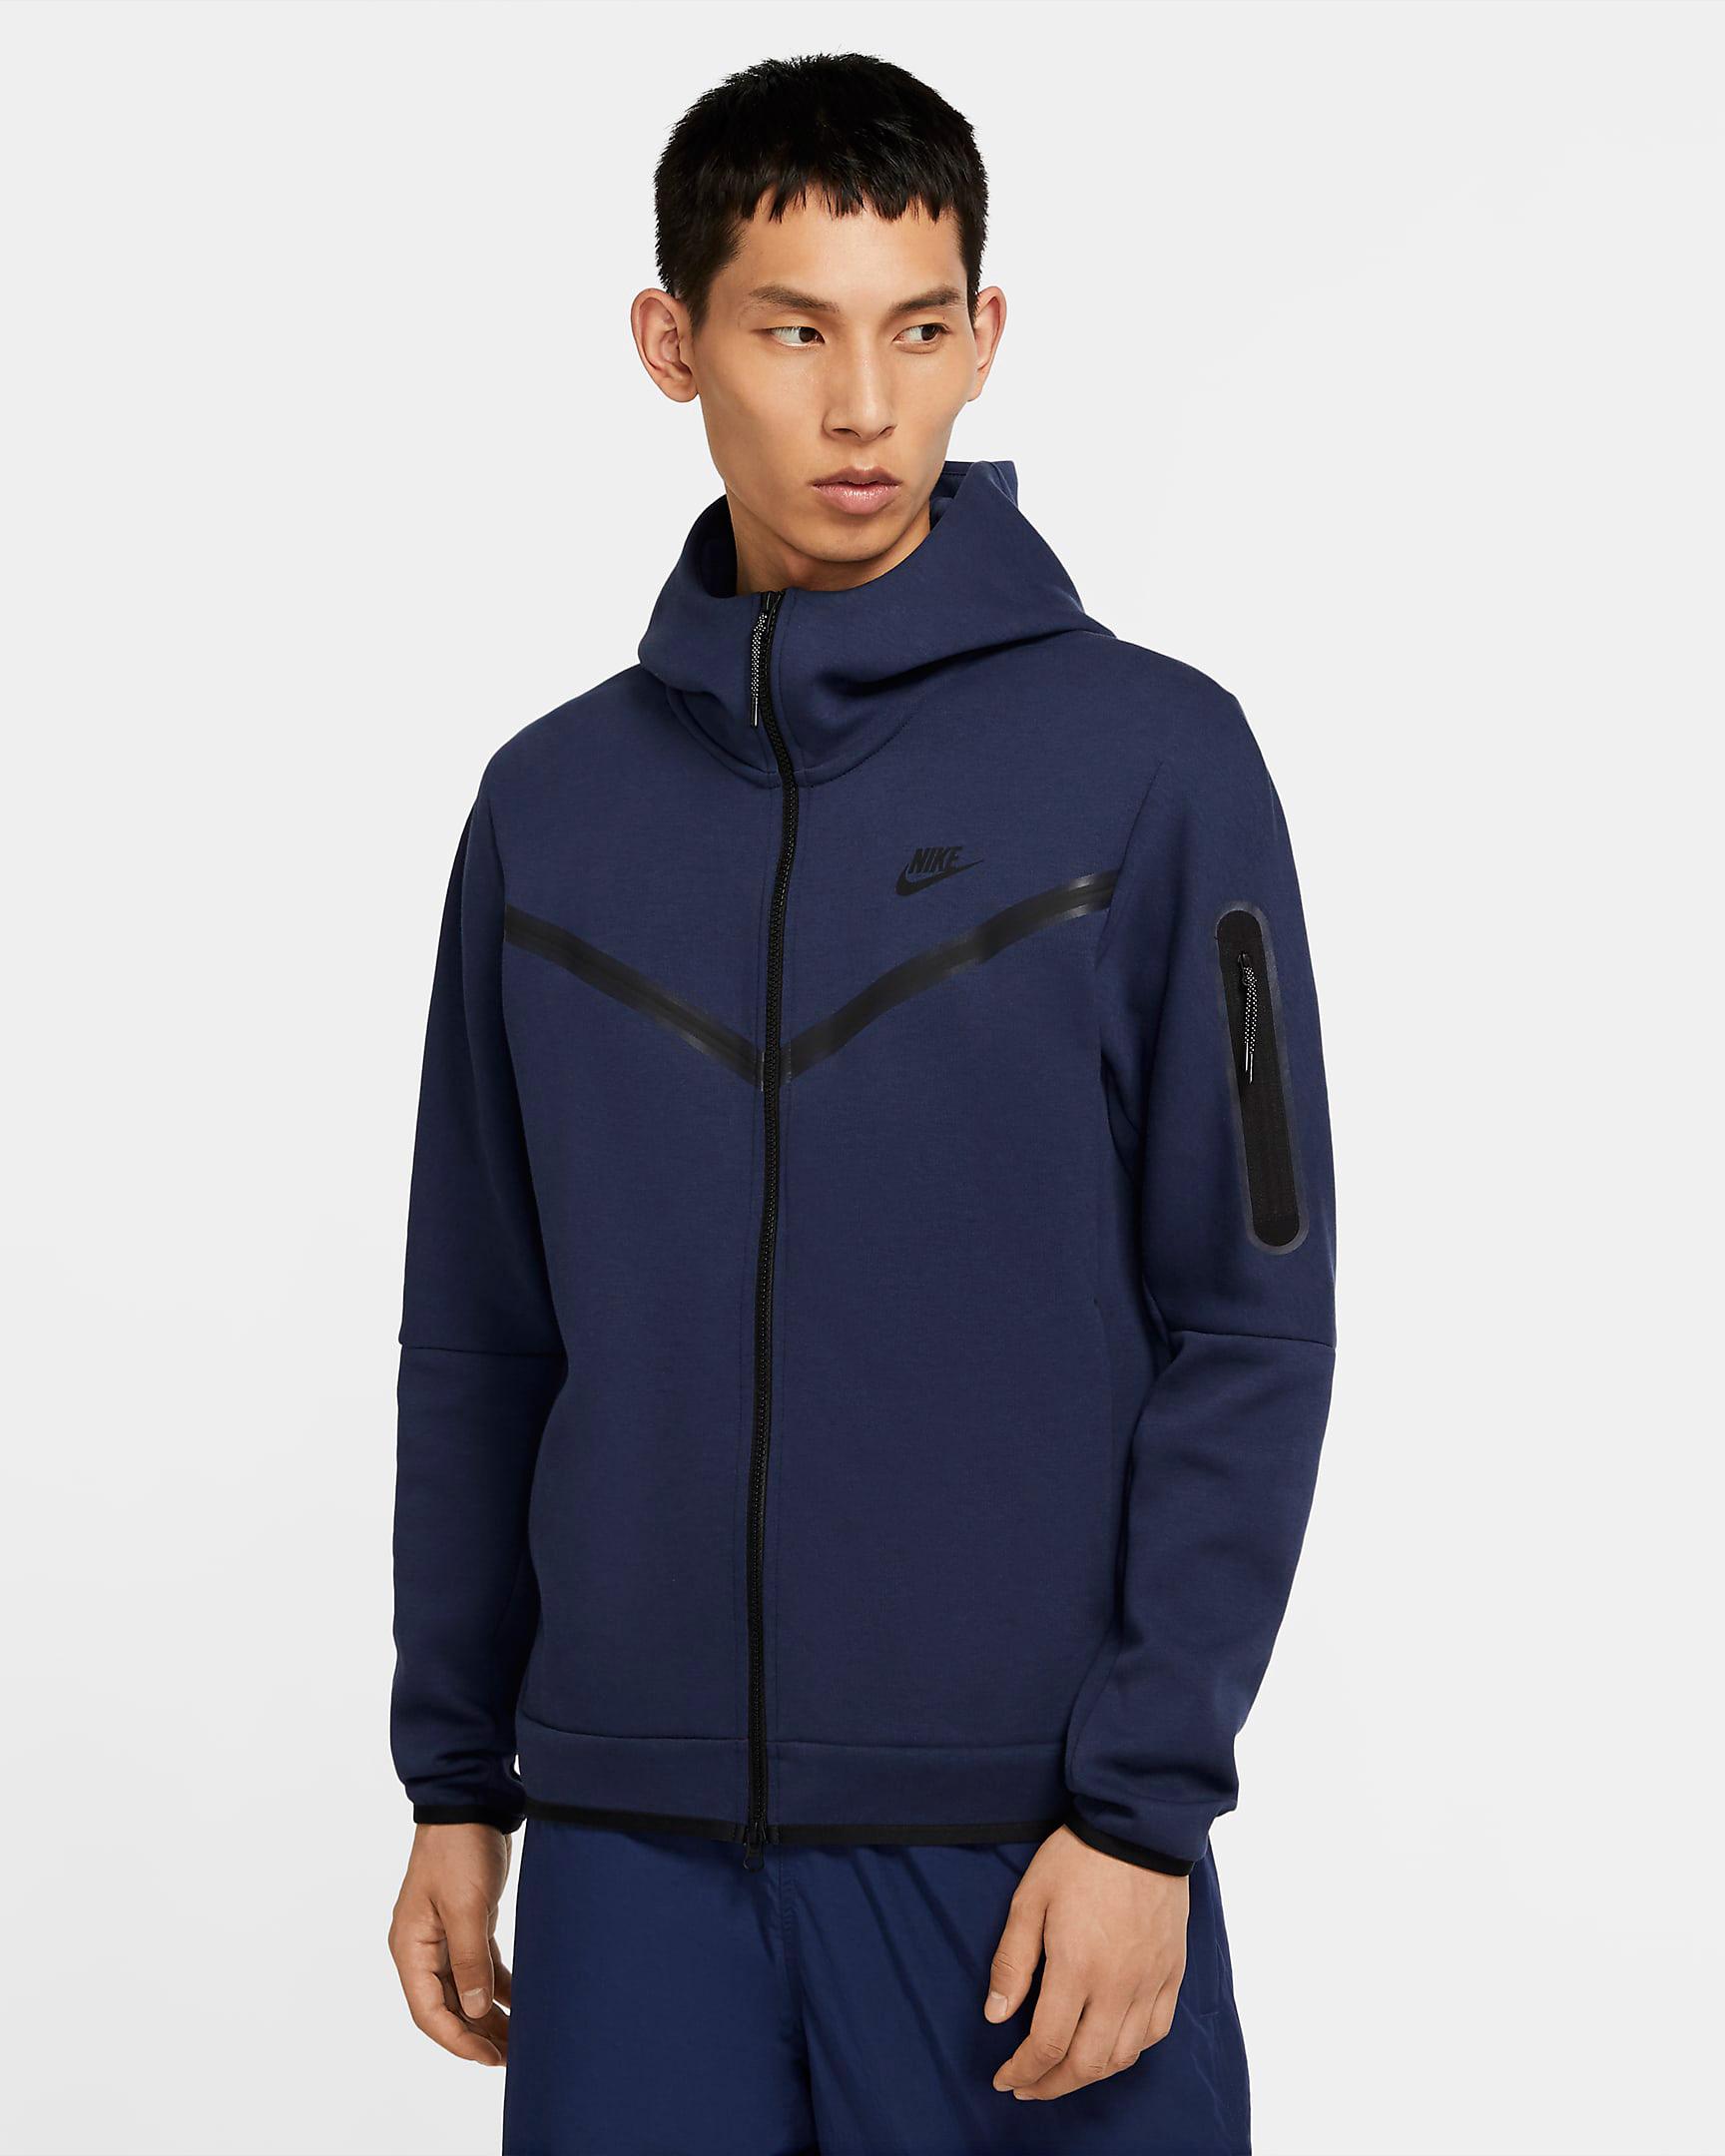 jordan-3-midnight-navy-nike-tech-fleece-hoodie